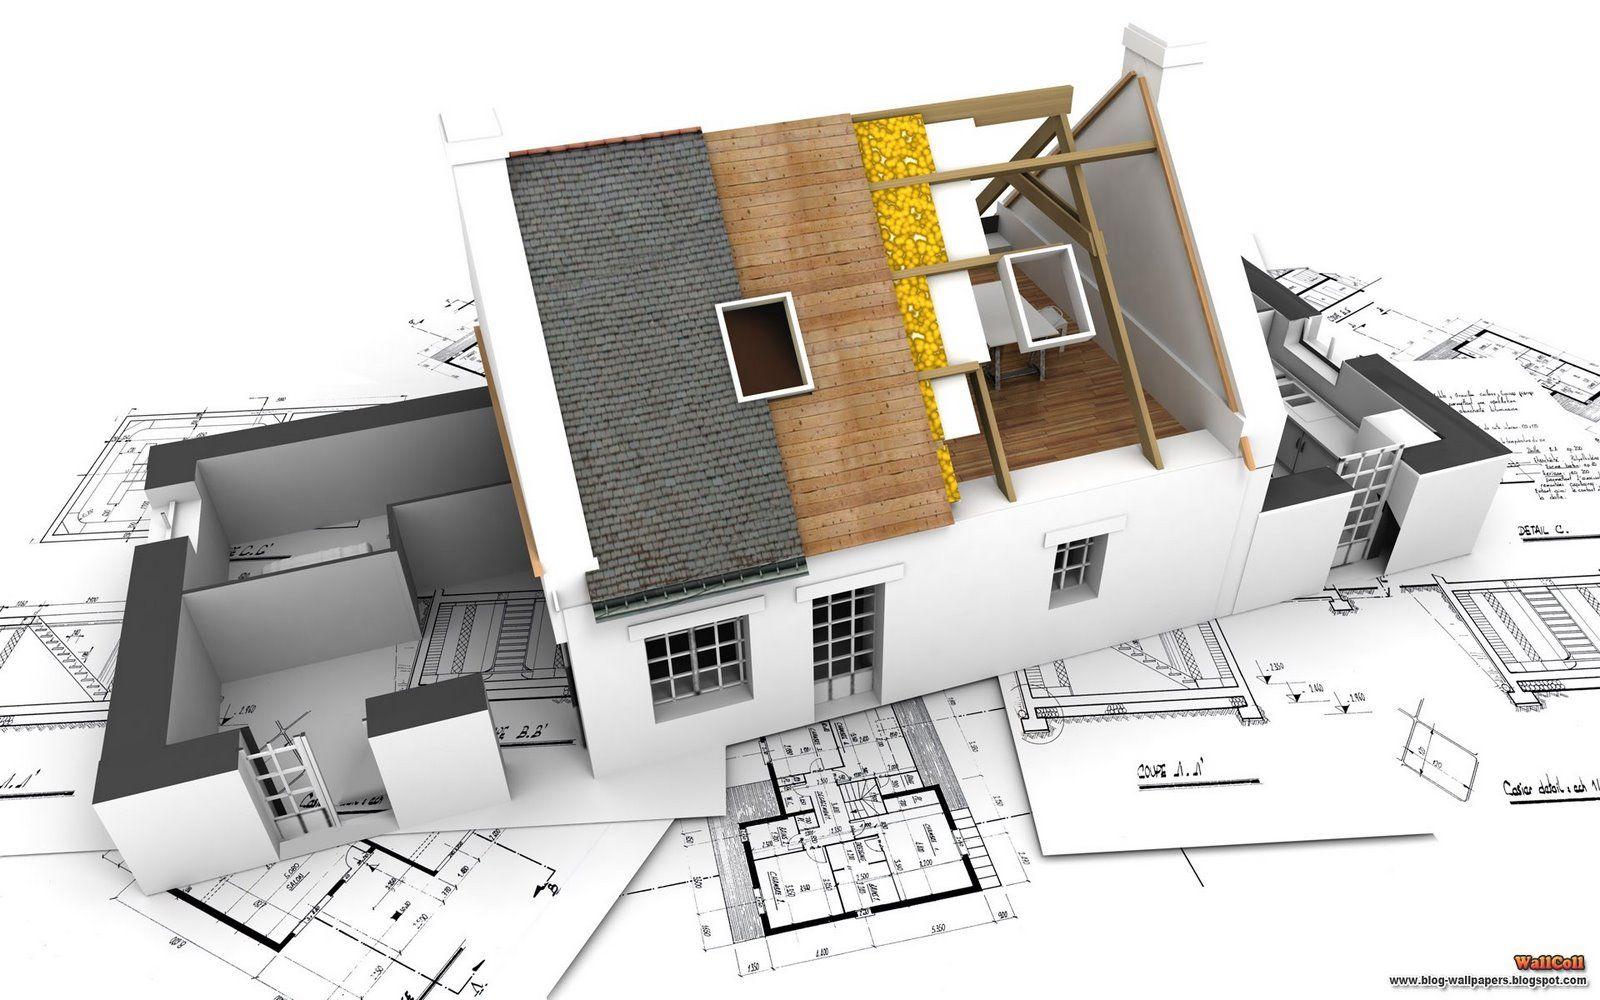 Architecture Design Google Search Home Remodeling Contractors Home Improvement Contractors Remodeling Contractors